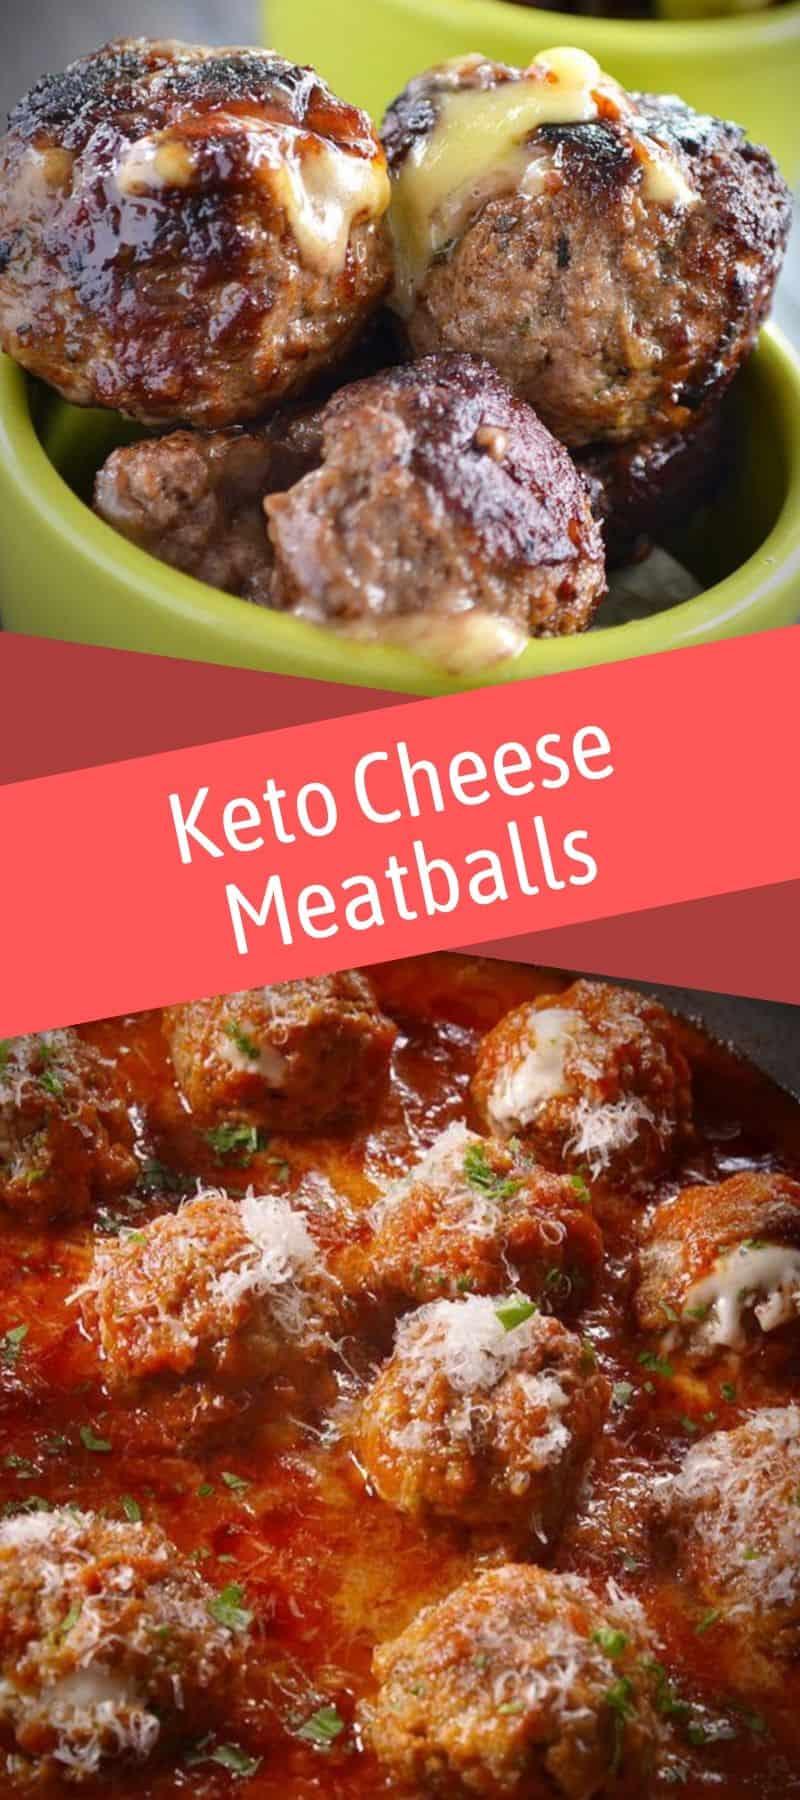 Keto Cheese Meatballs Recipe 3